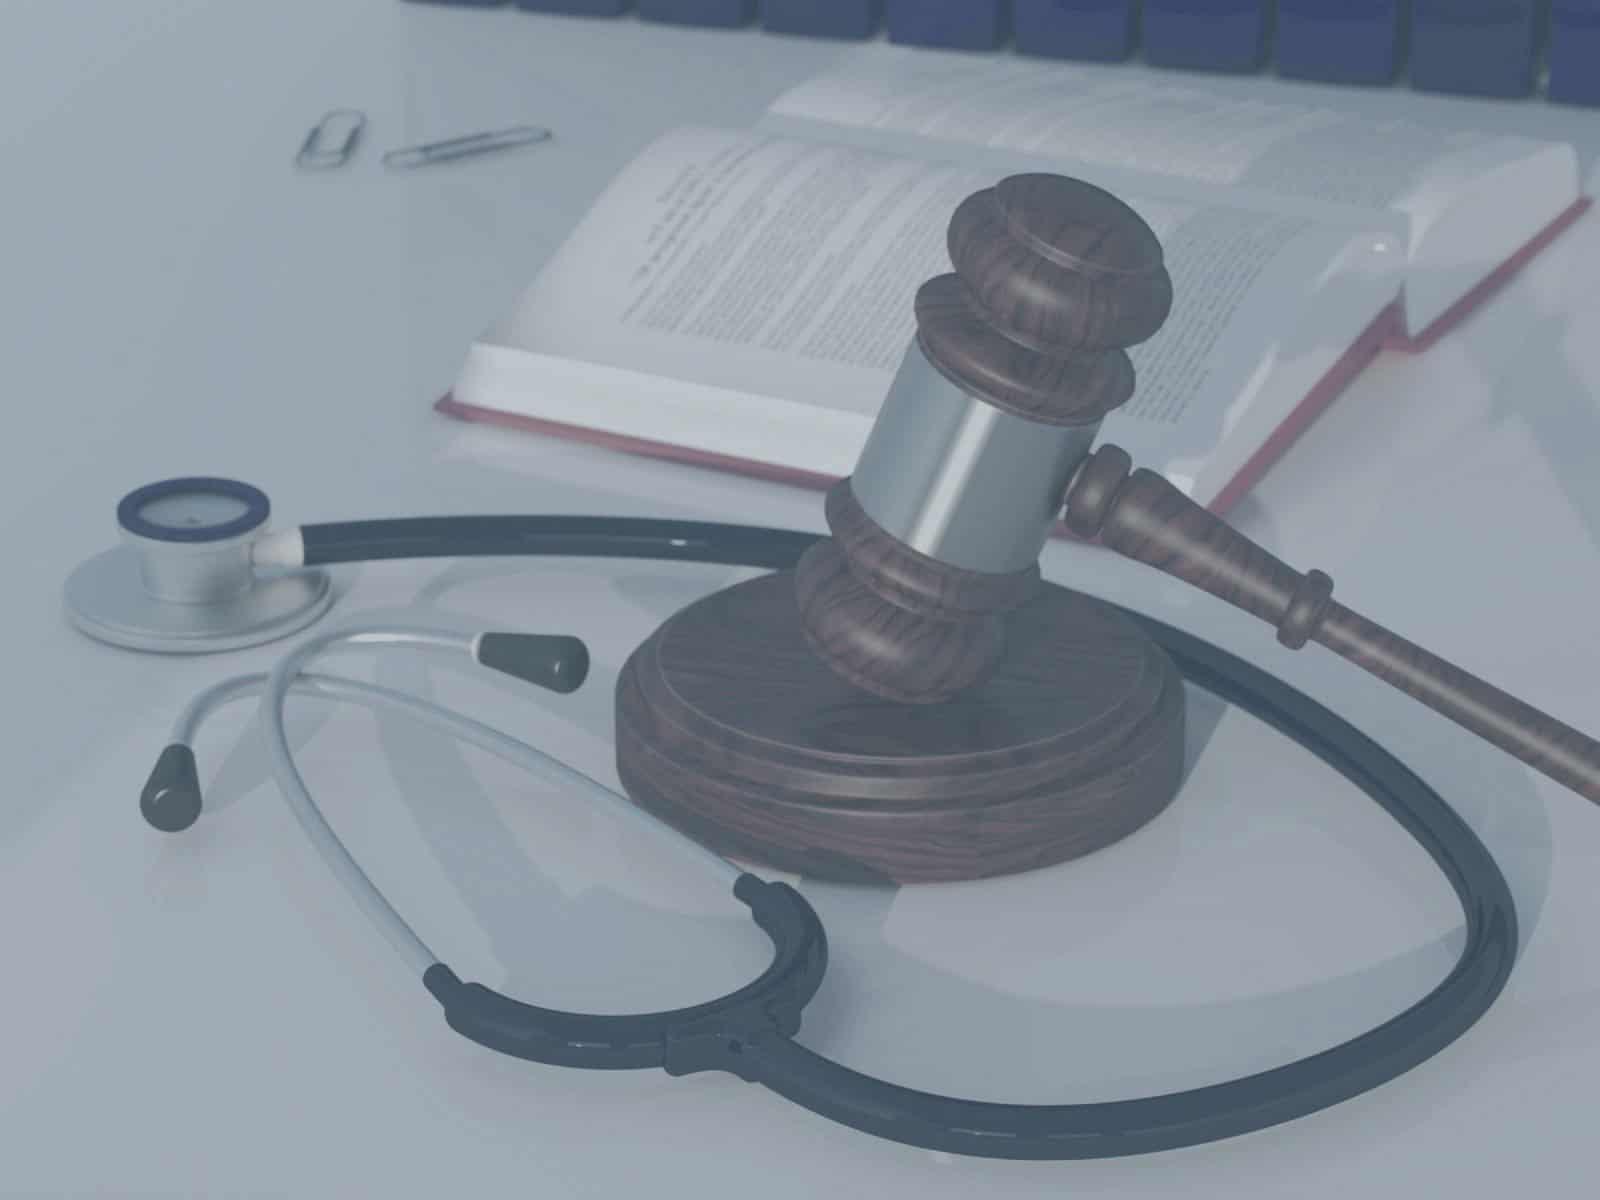 Medical Malpractice - Medical Malpractice - Guerra Law Group